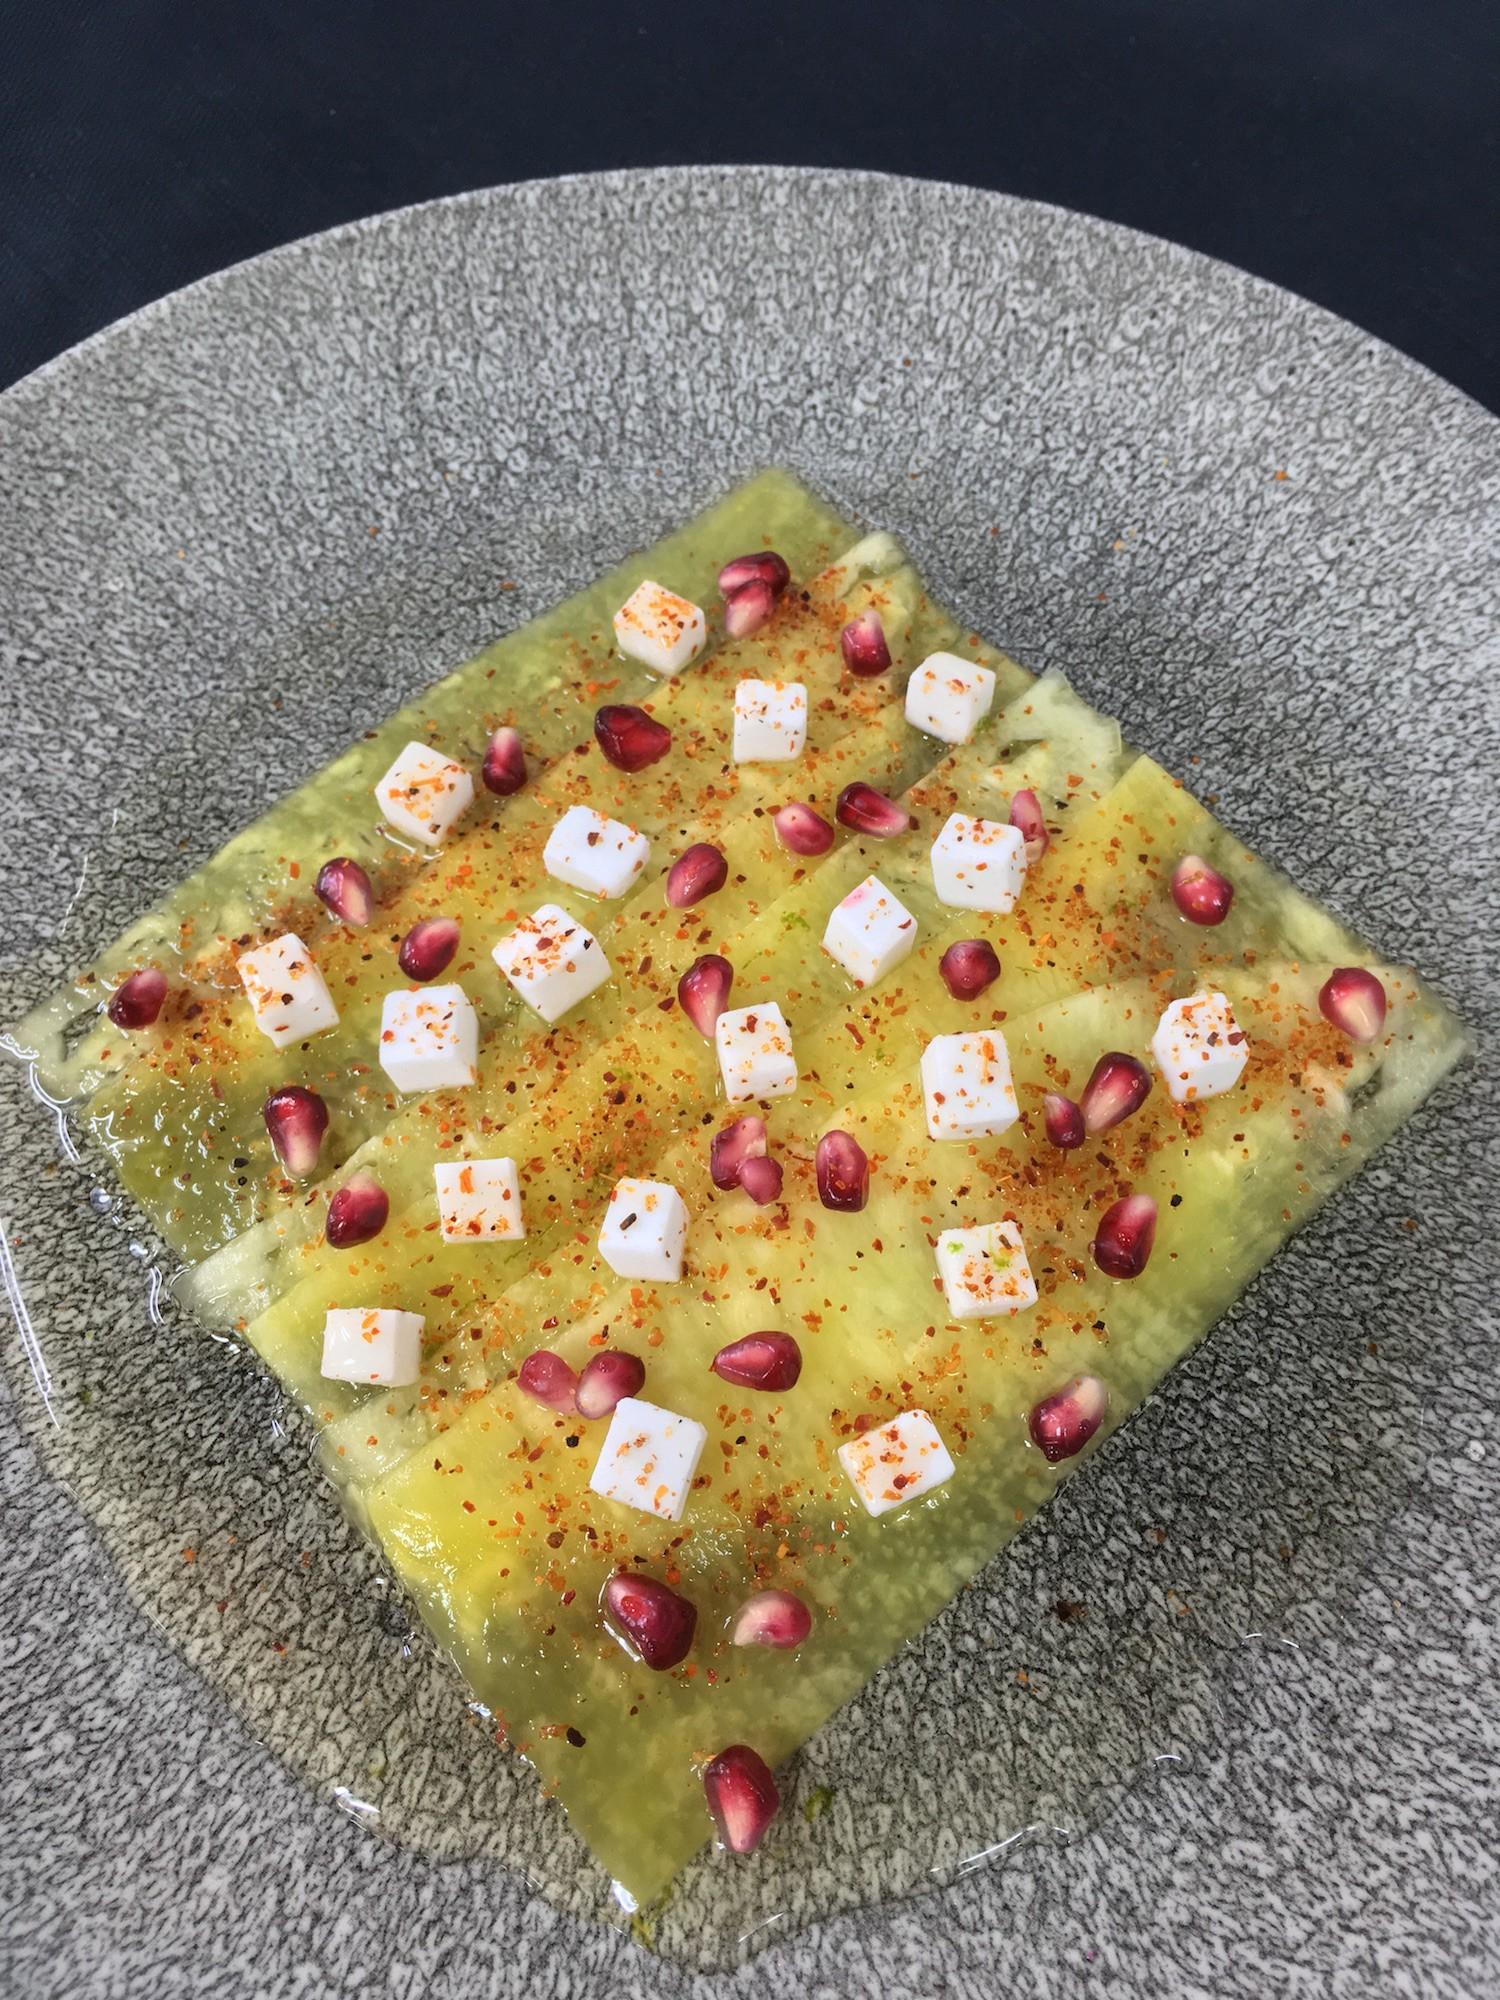 Pineapple Carpaccio, Yuzu Syrup, Pomegranate, Just like Feta, Tajin Spices by Franck Garanger — Apollo Group